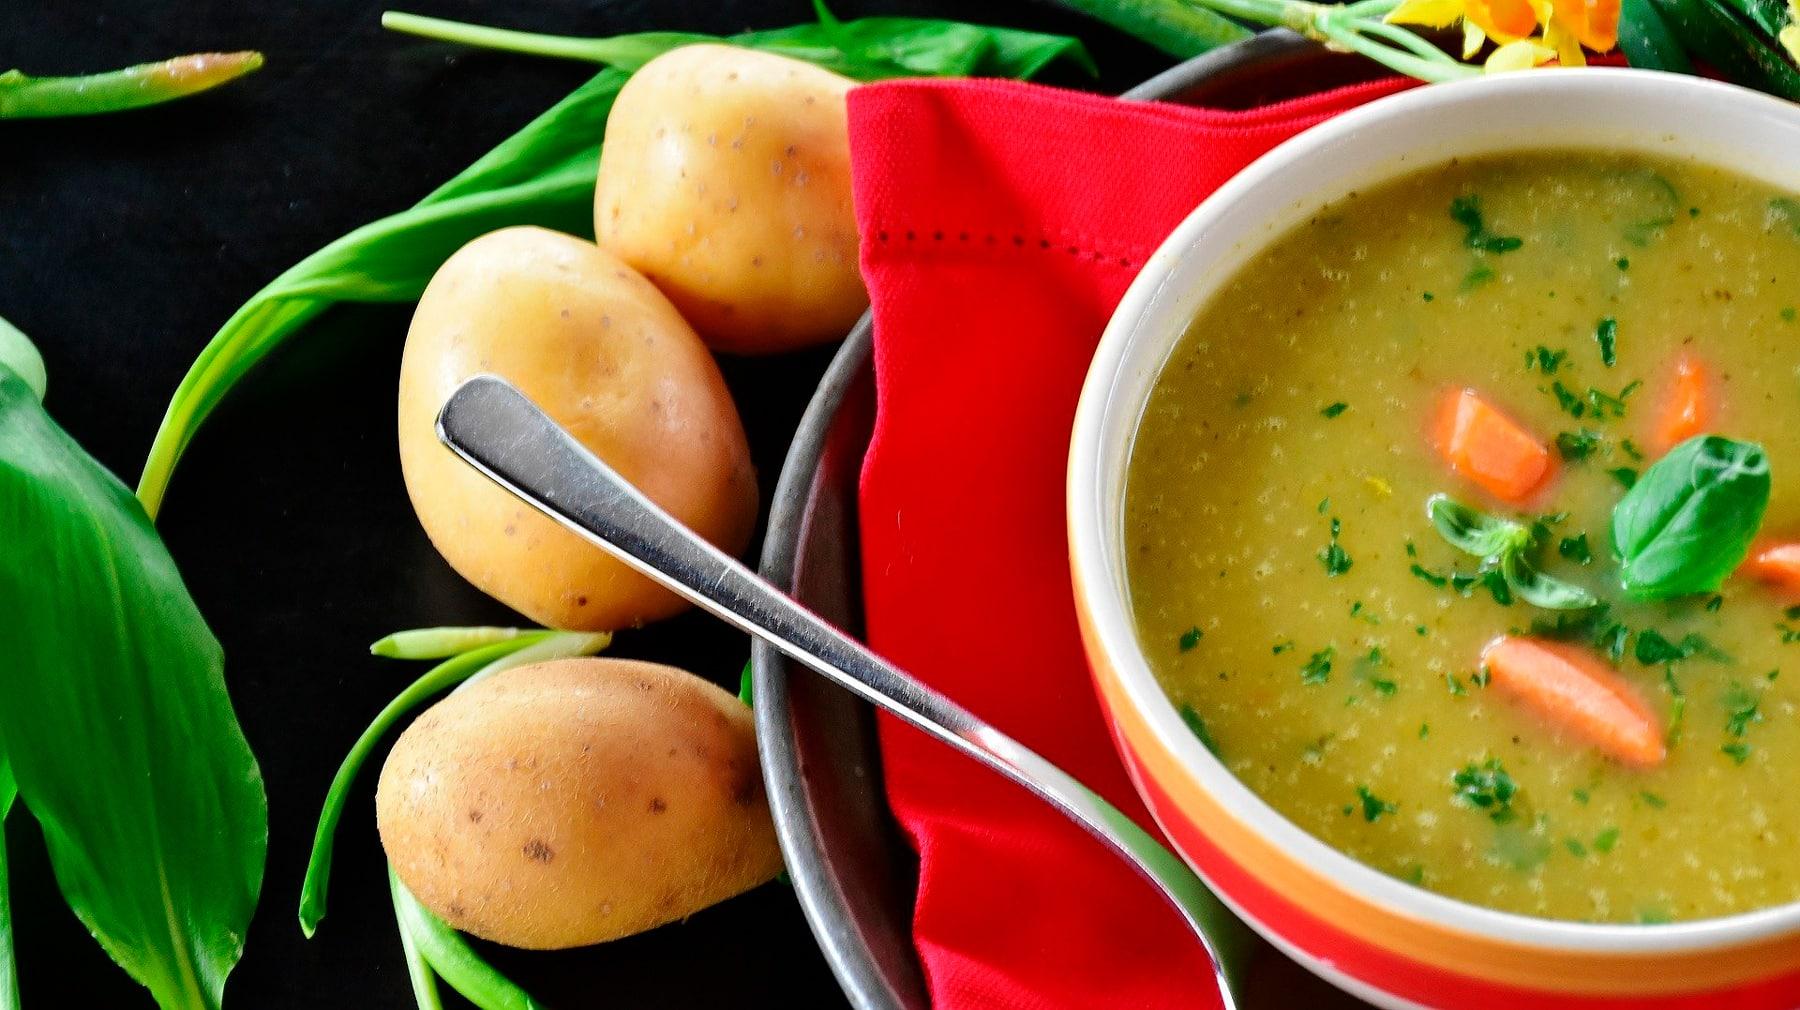 Seis alimentos para cuidar de tu garganta irritada e inflamada